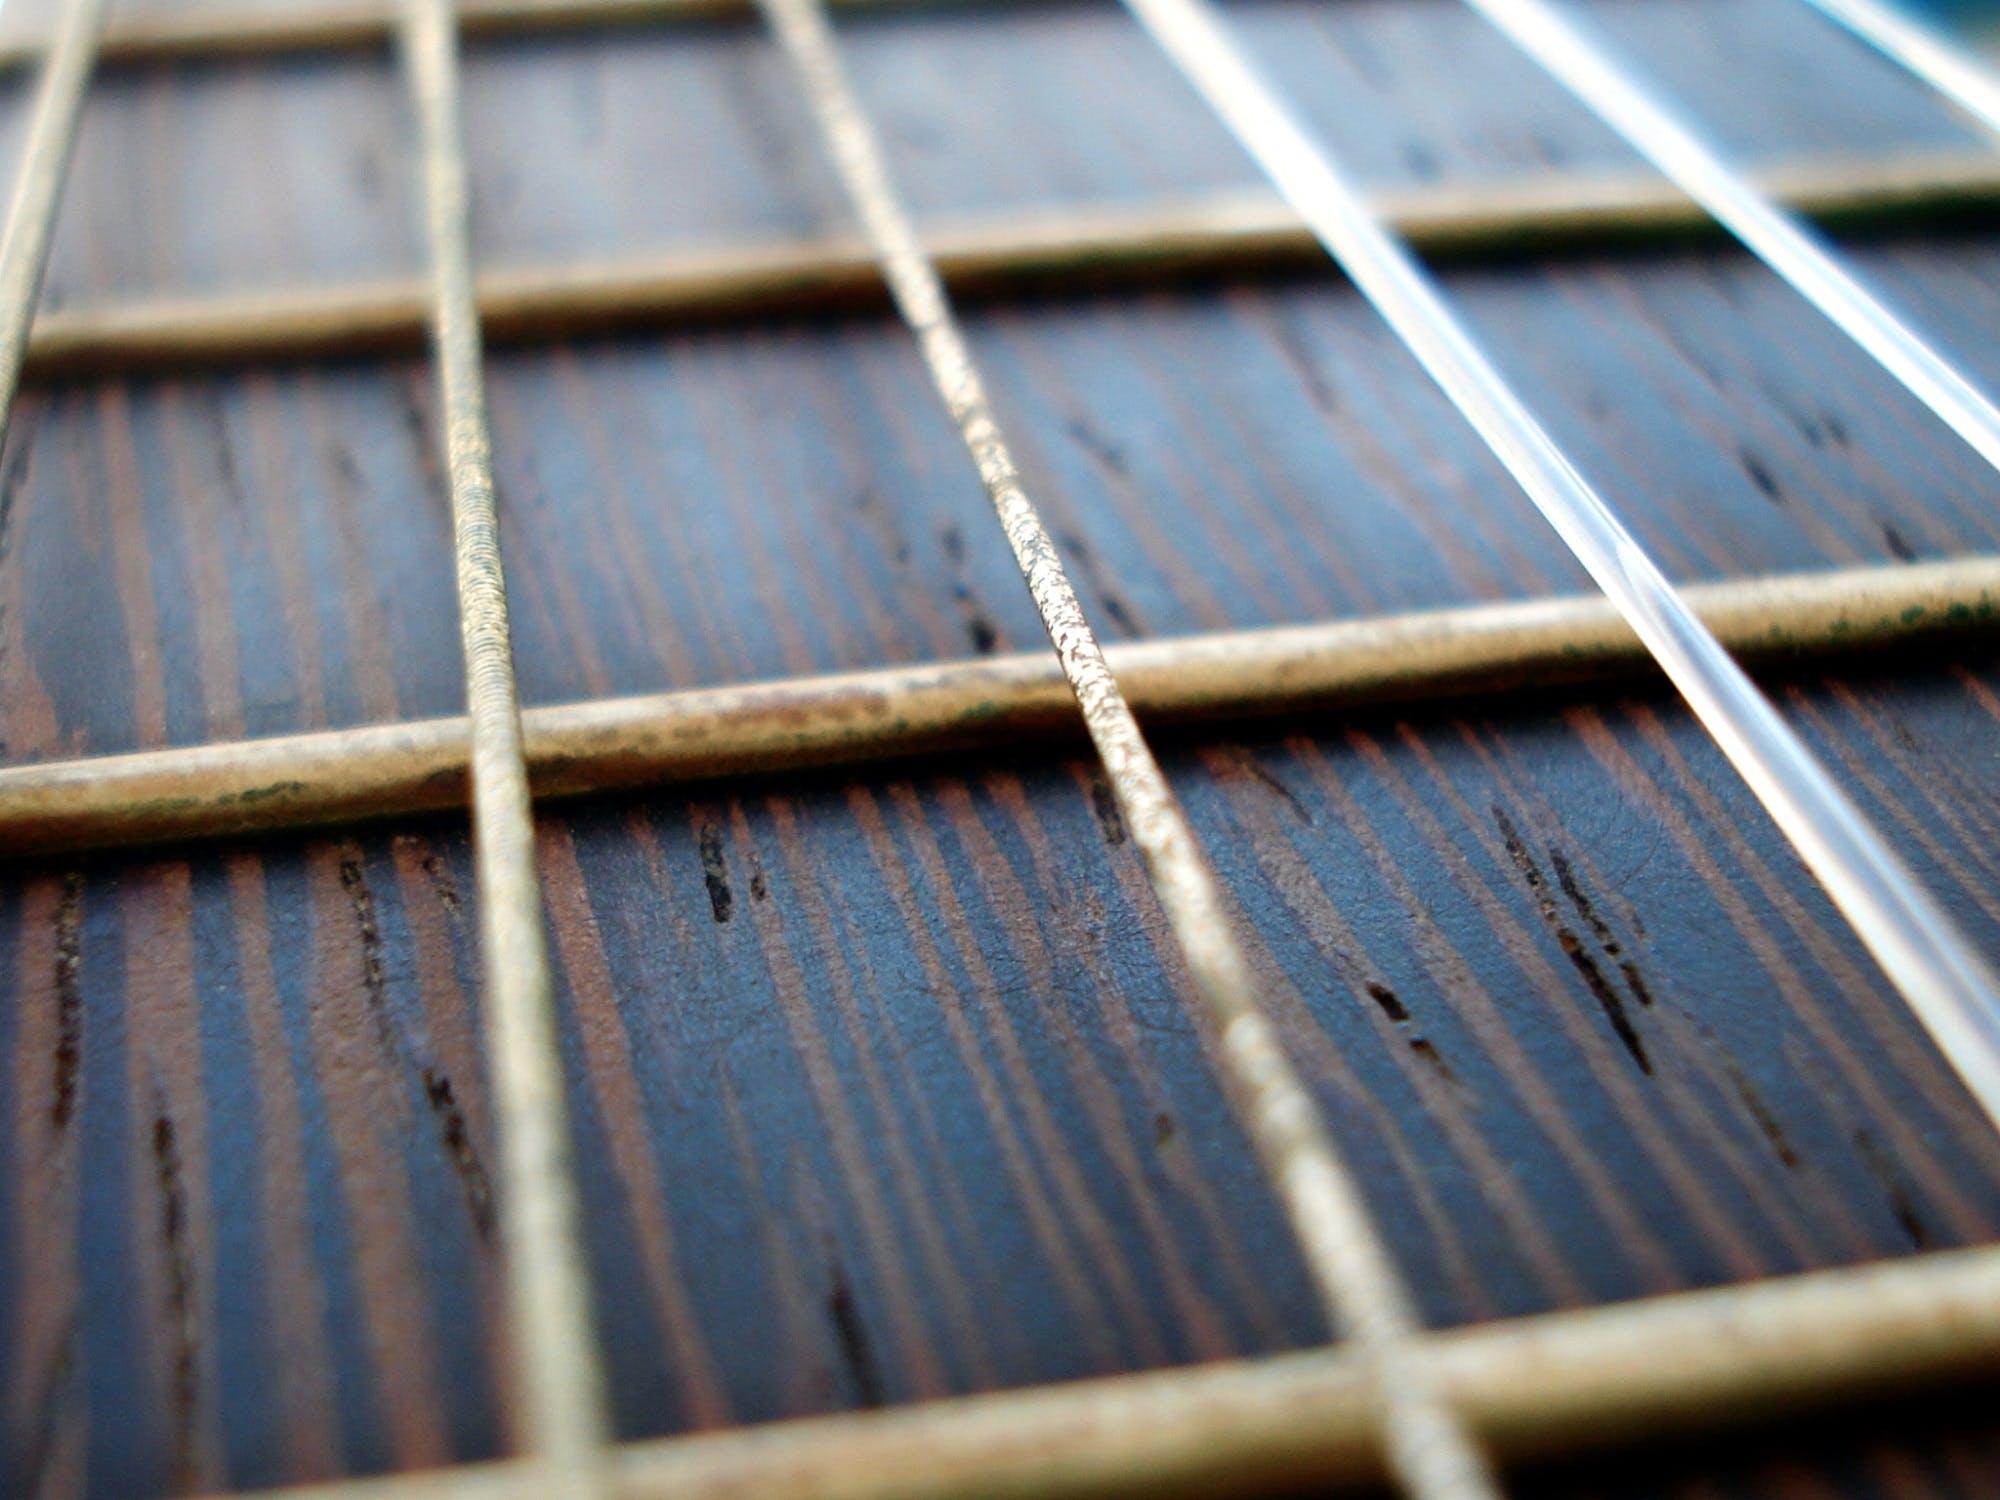 Free stock photo of guitar, detail, chord, theme patterns